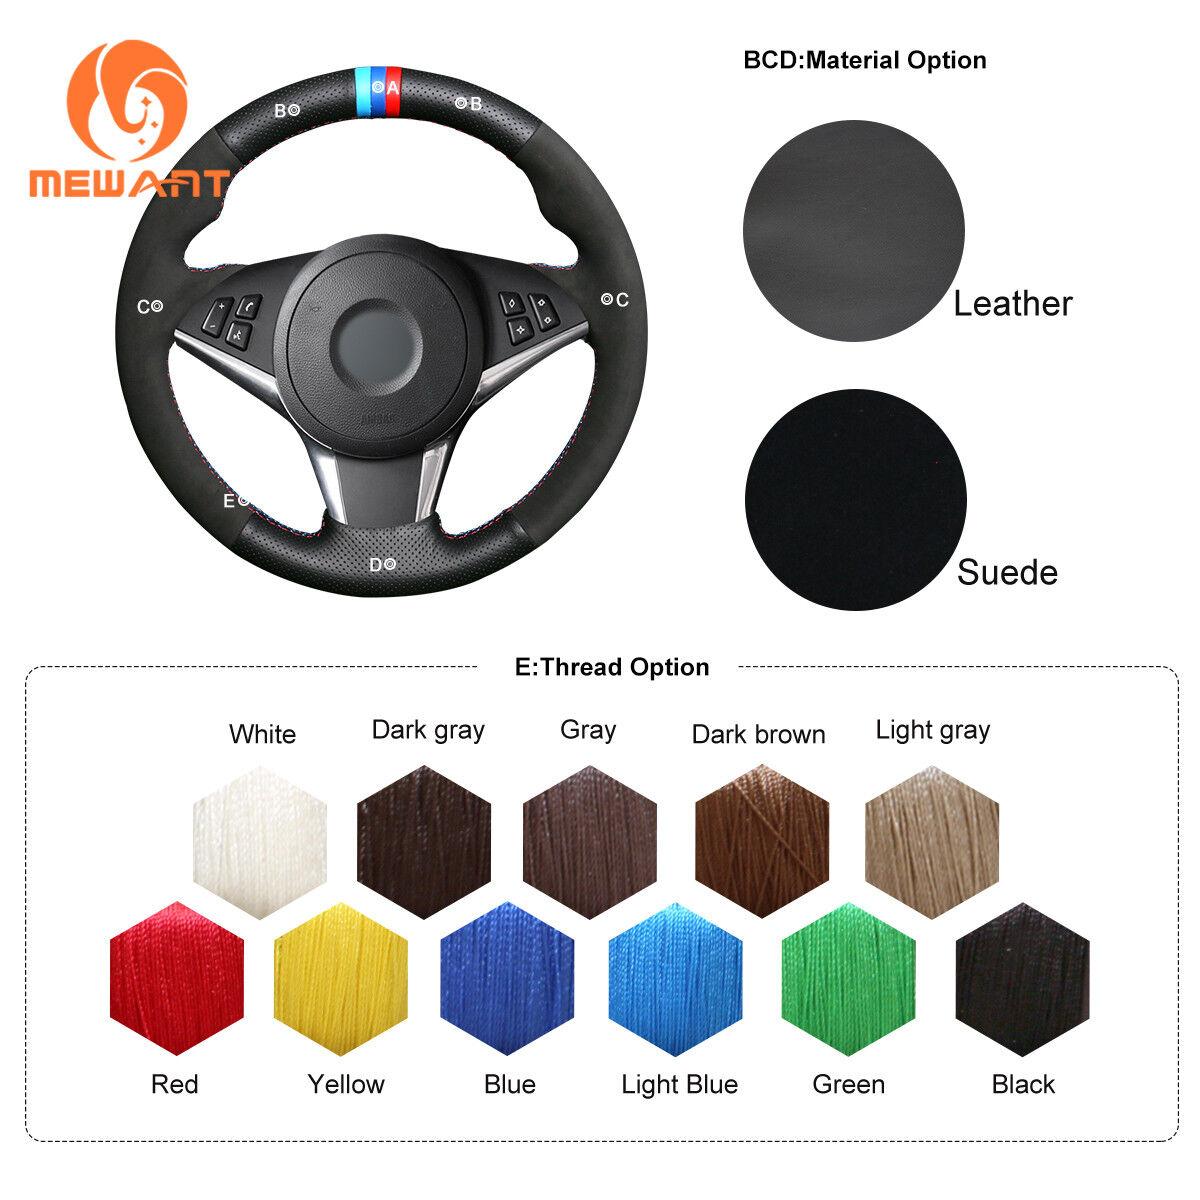 DIY Black Suede Steering Wheel Cover for BMW E60 530d 545i 550i E64 #01171